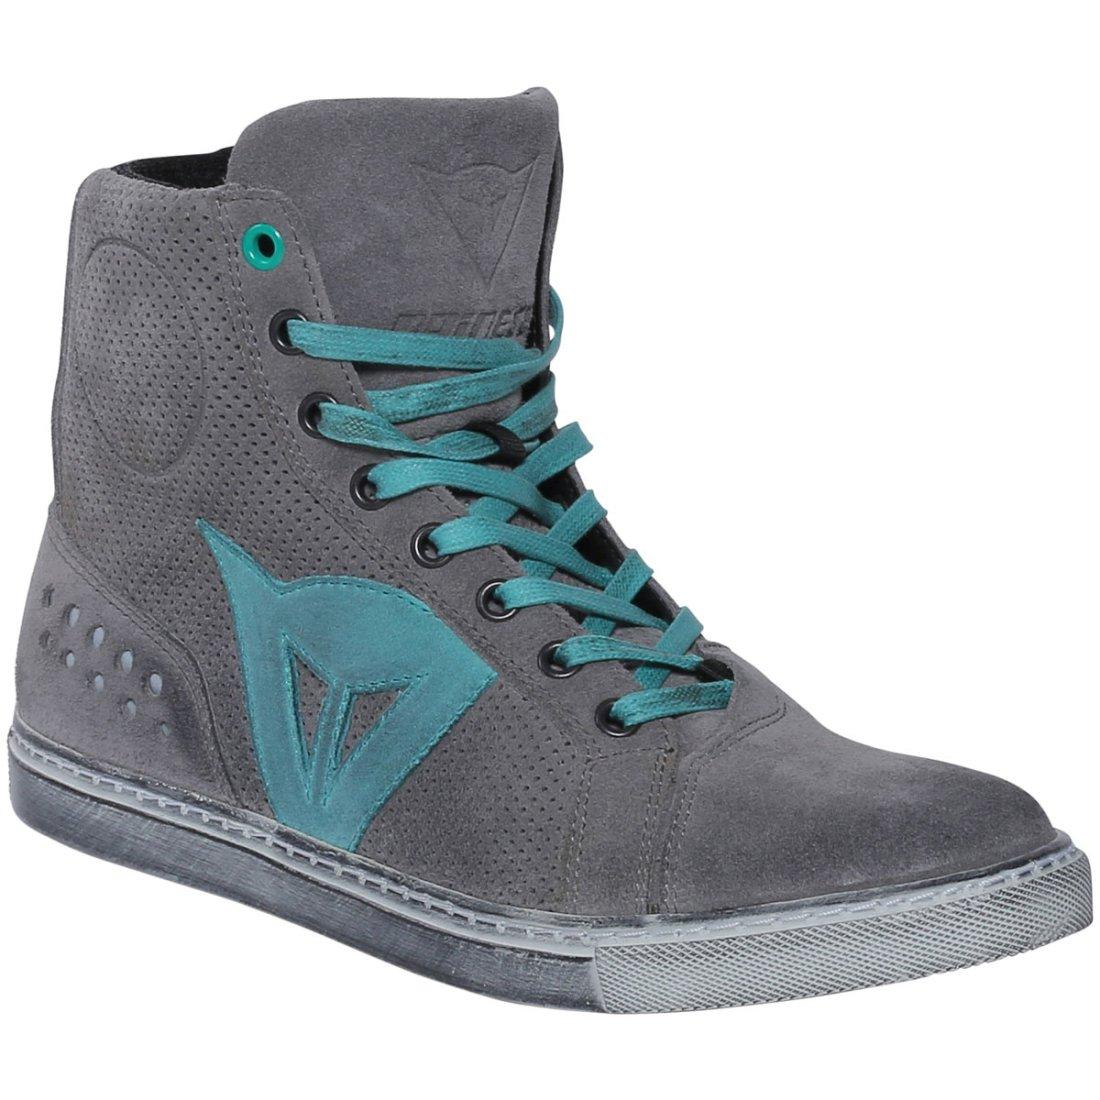 DAINESE Street Biker Air Lady Gray Aquamarine Boots